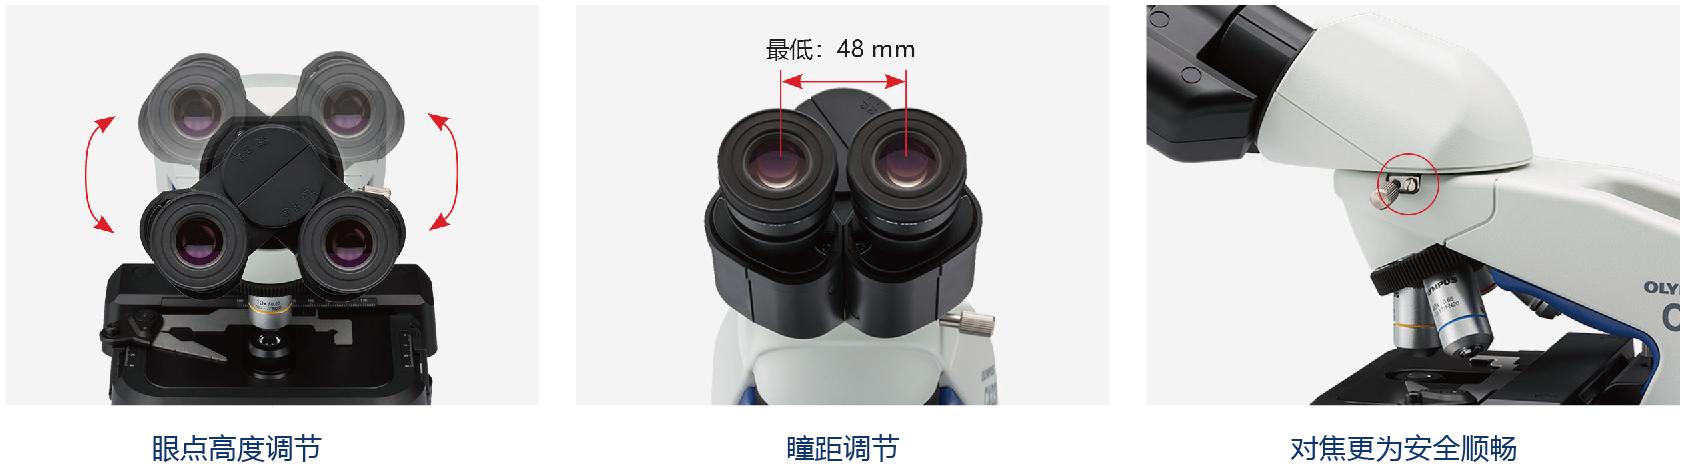 OLYMPUS向日葵污app下载 CX23生物顯微鏡 【三目|雙目|熒光|相差】-普赫光電